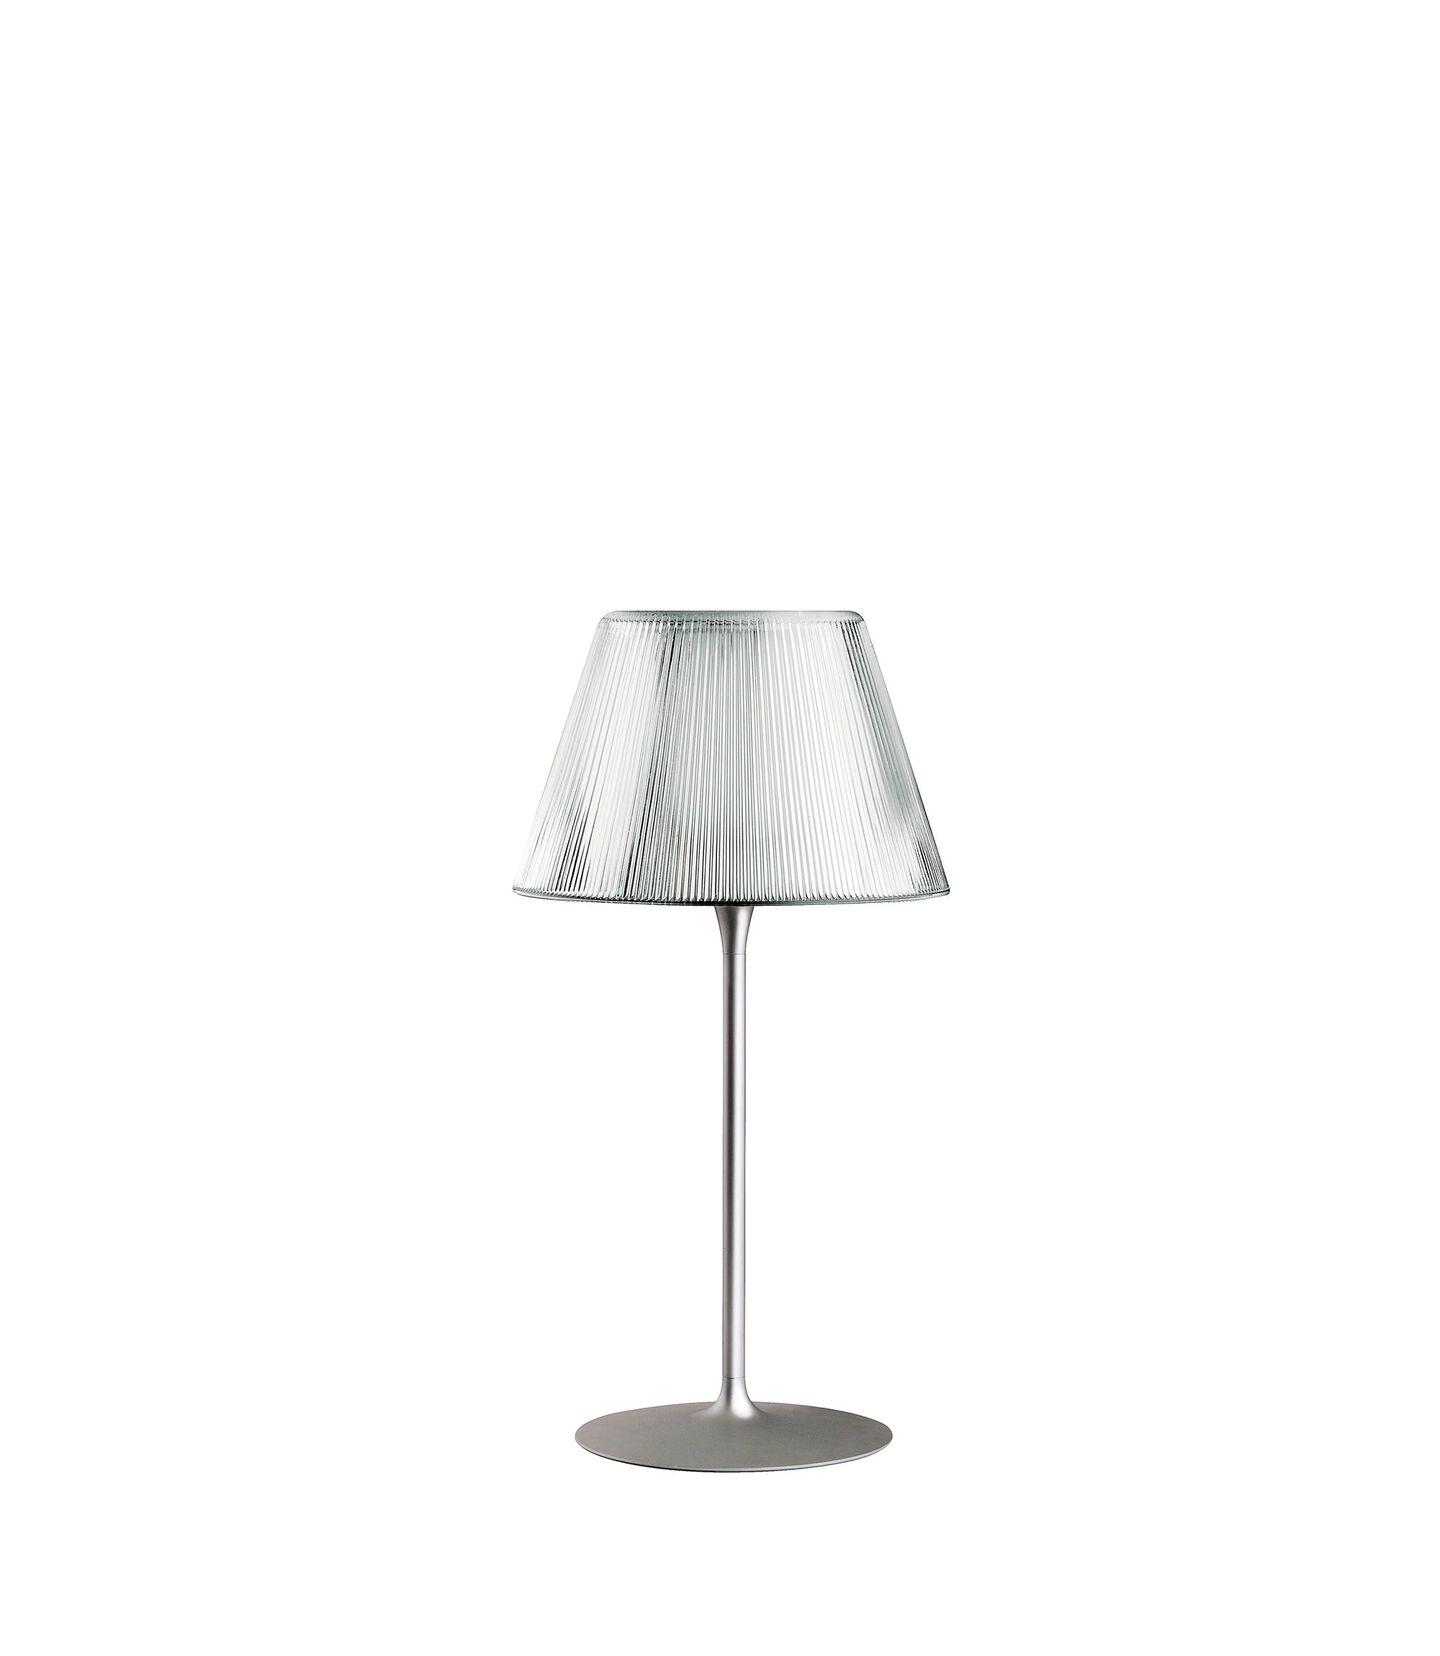 romeo-moon-table-starck-flos-F6107000-product-still-life-big